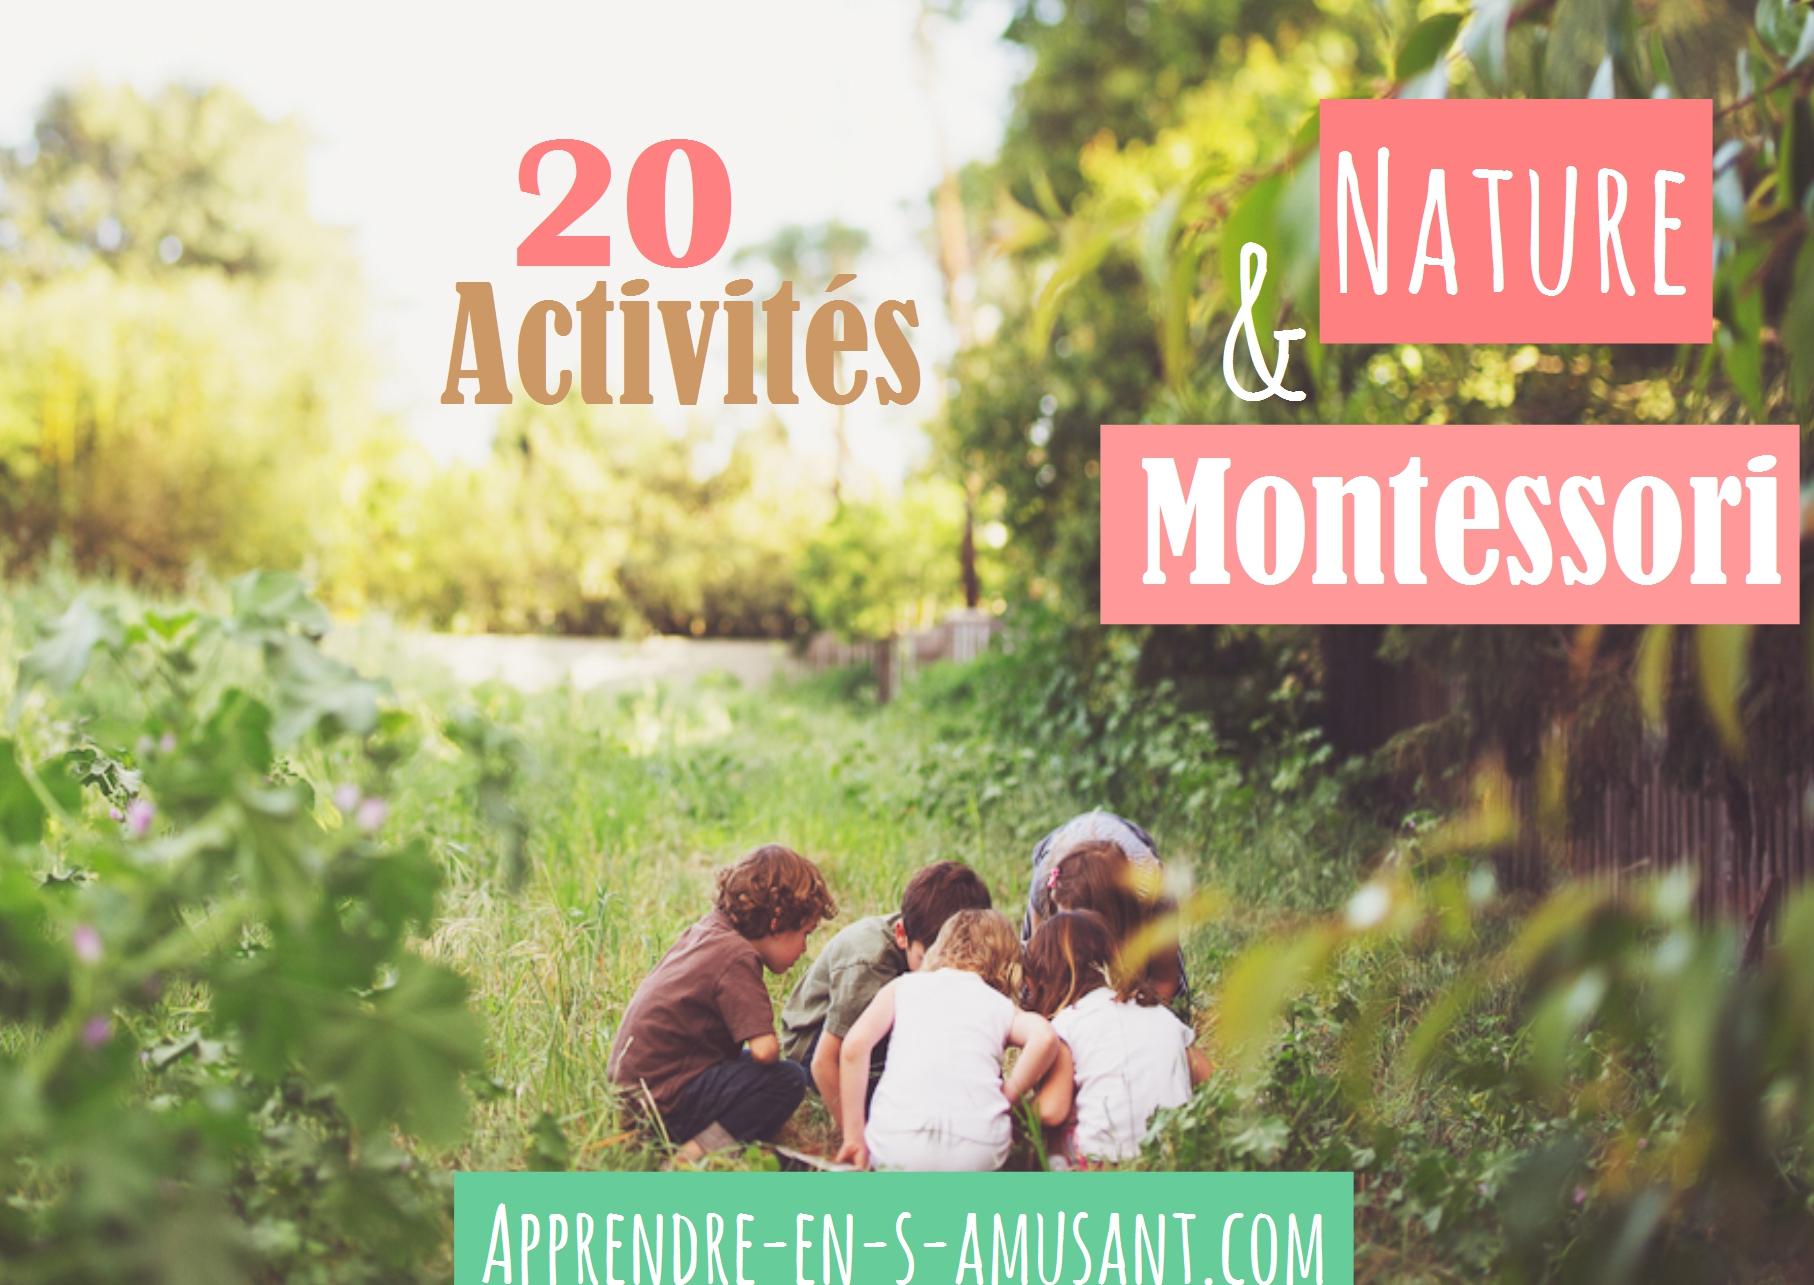 Couverture article Activites Nature Montessori